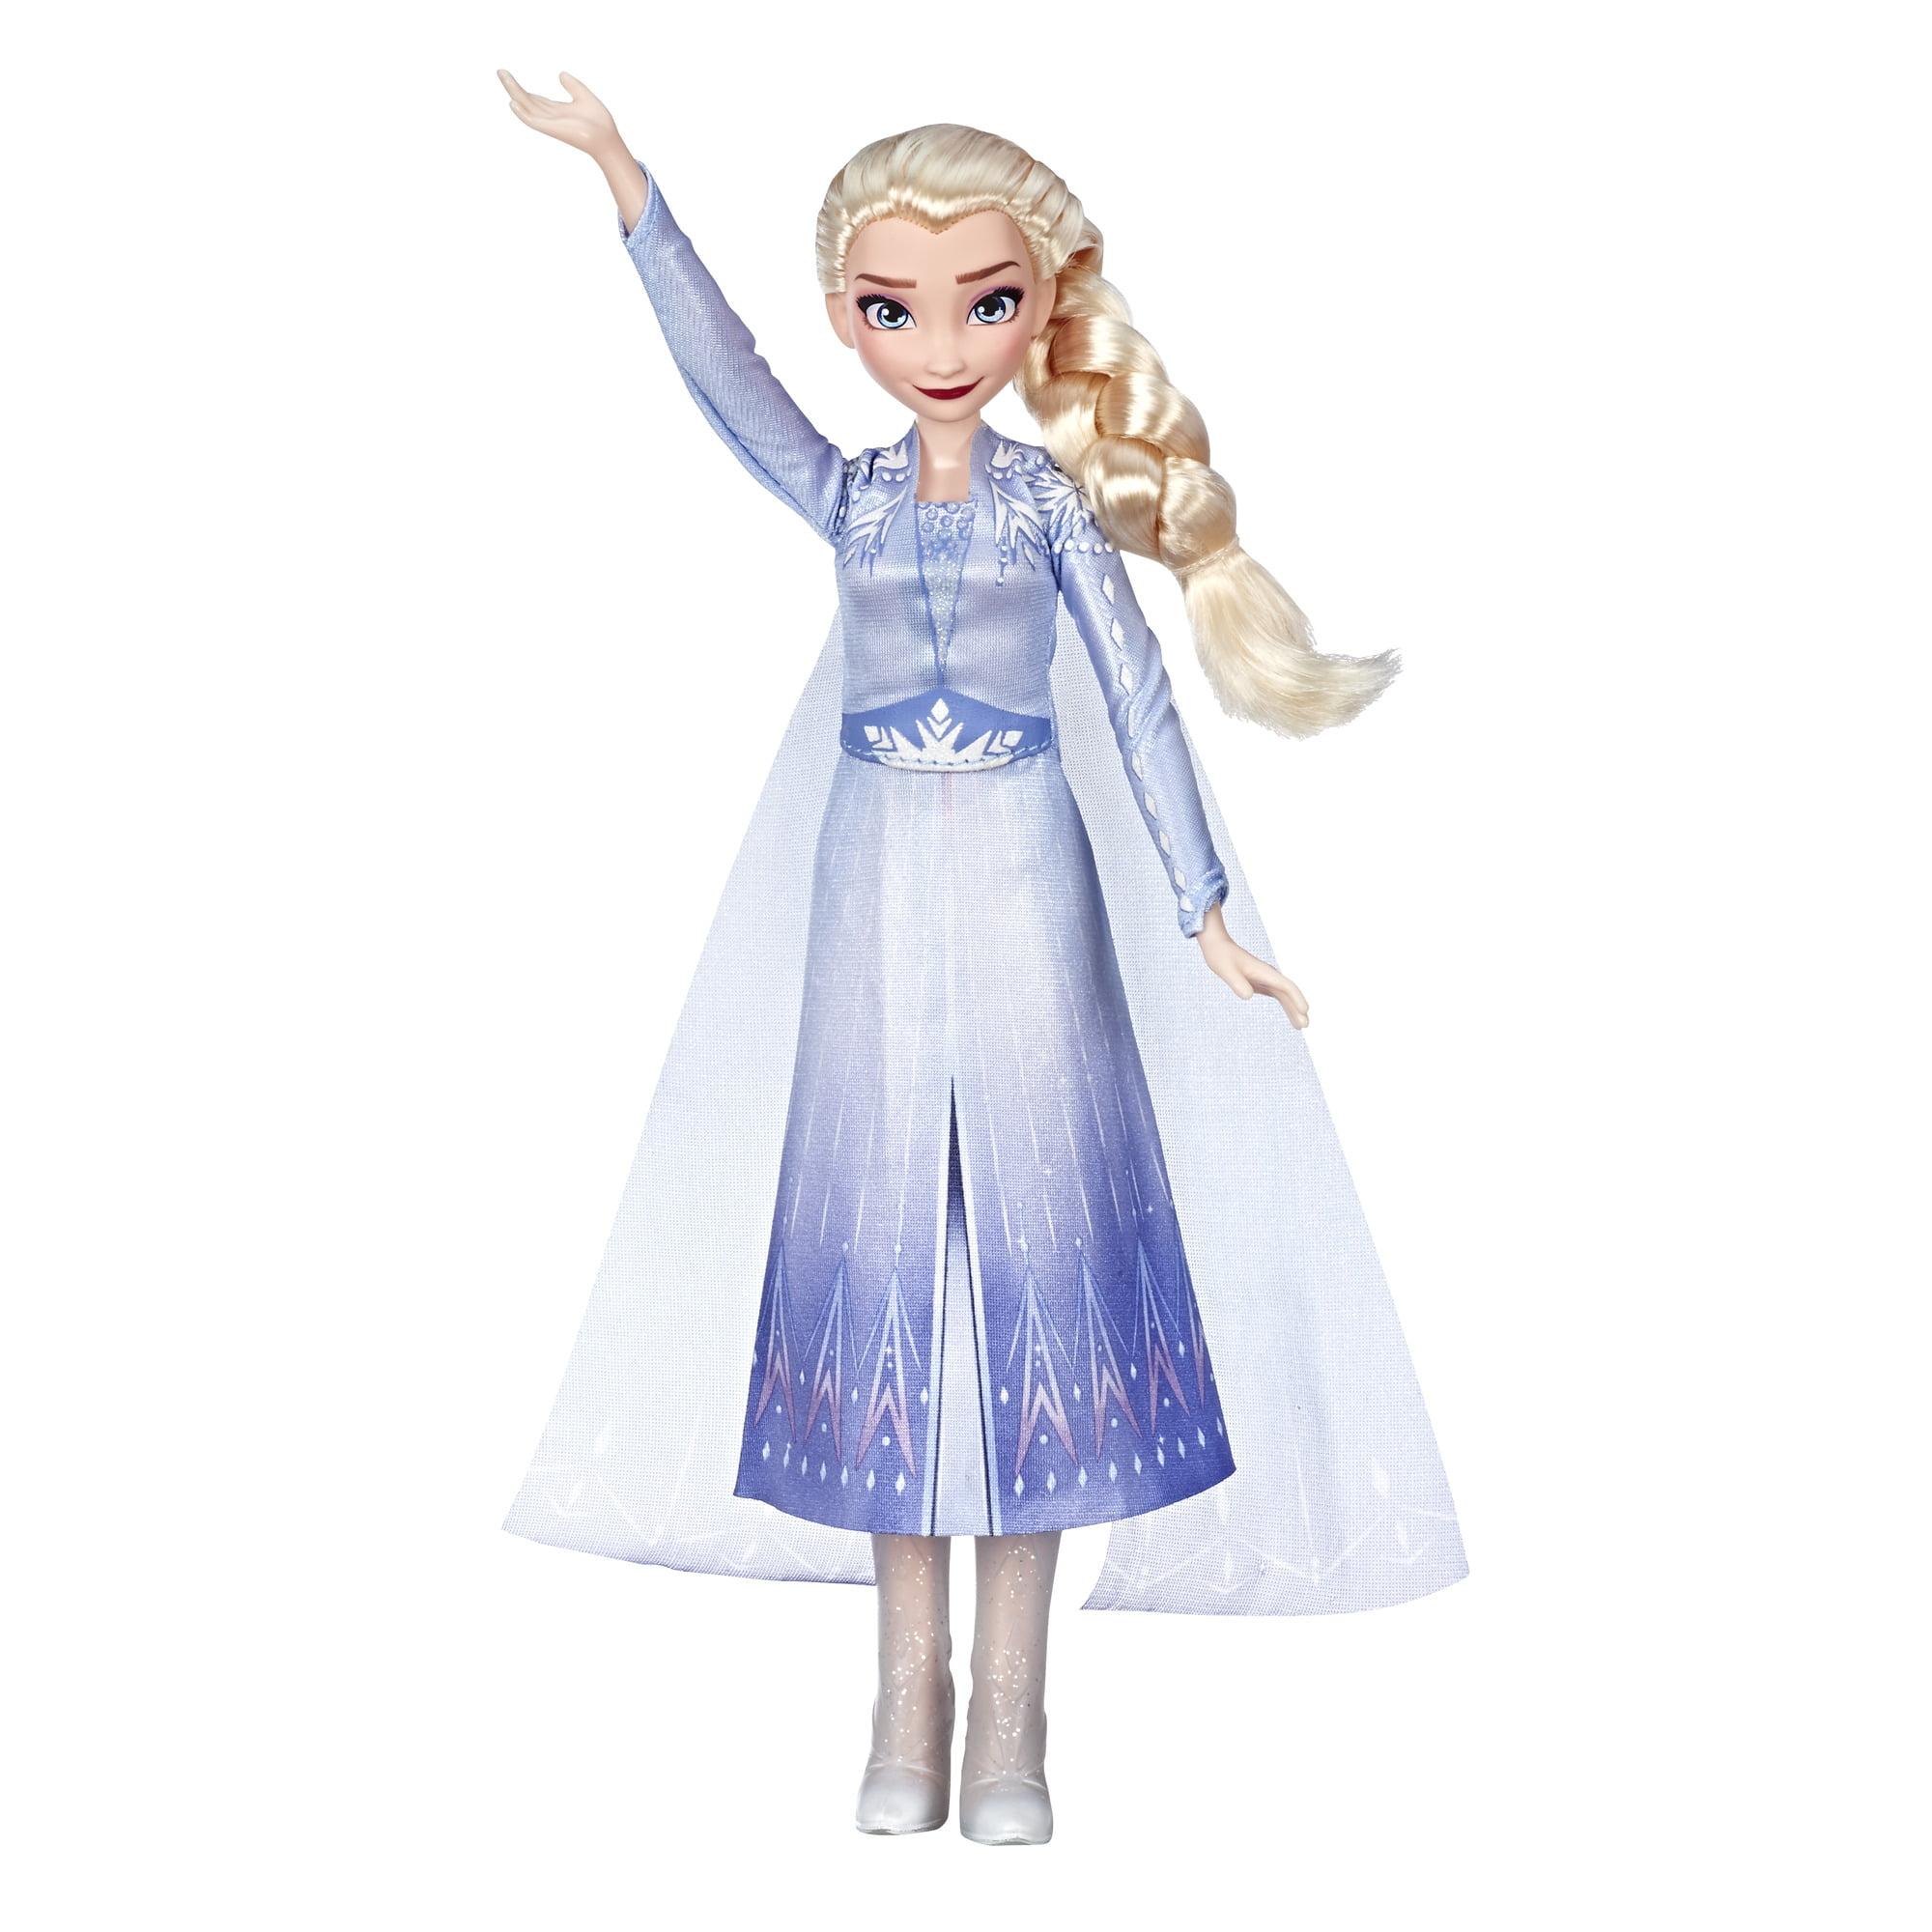 Disney Frozen 2 Singing Elsa Musical Fashion Doll with Blue Dress